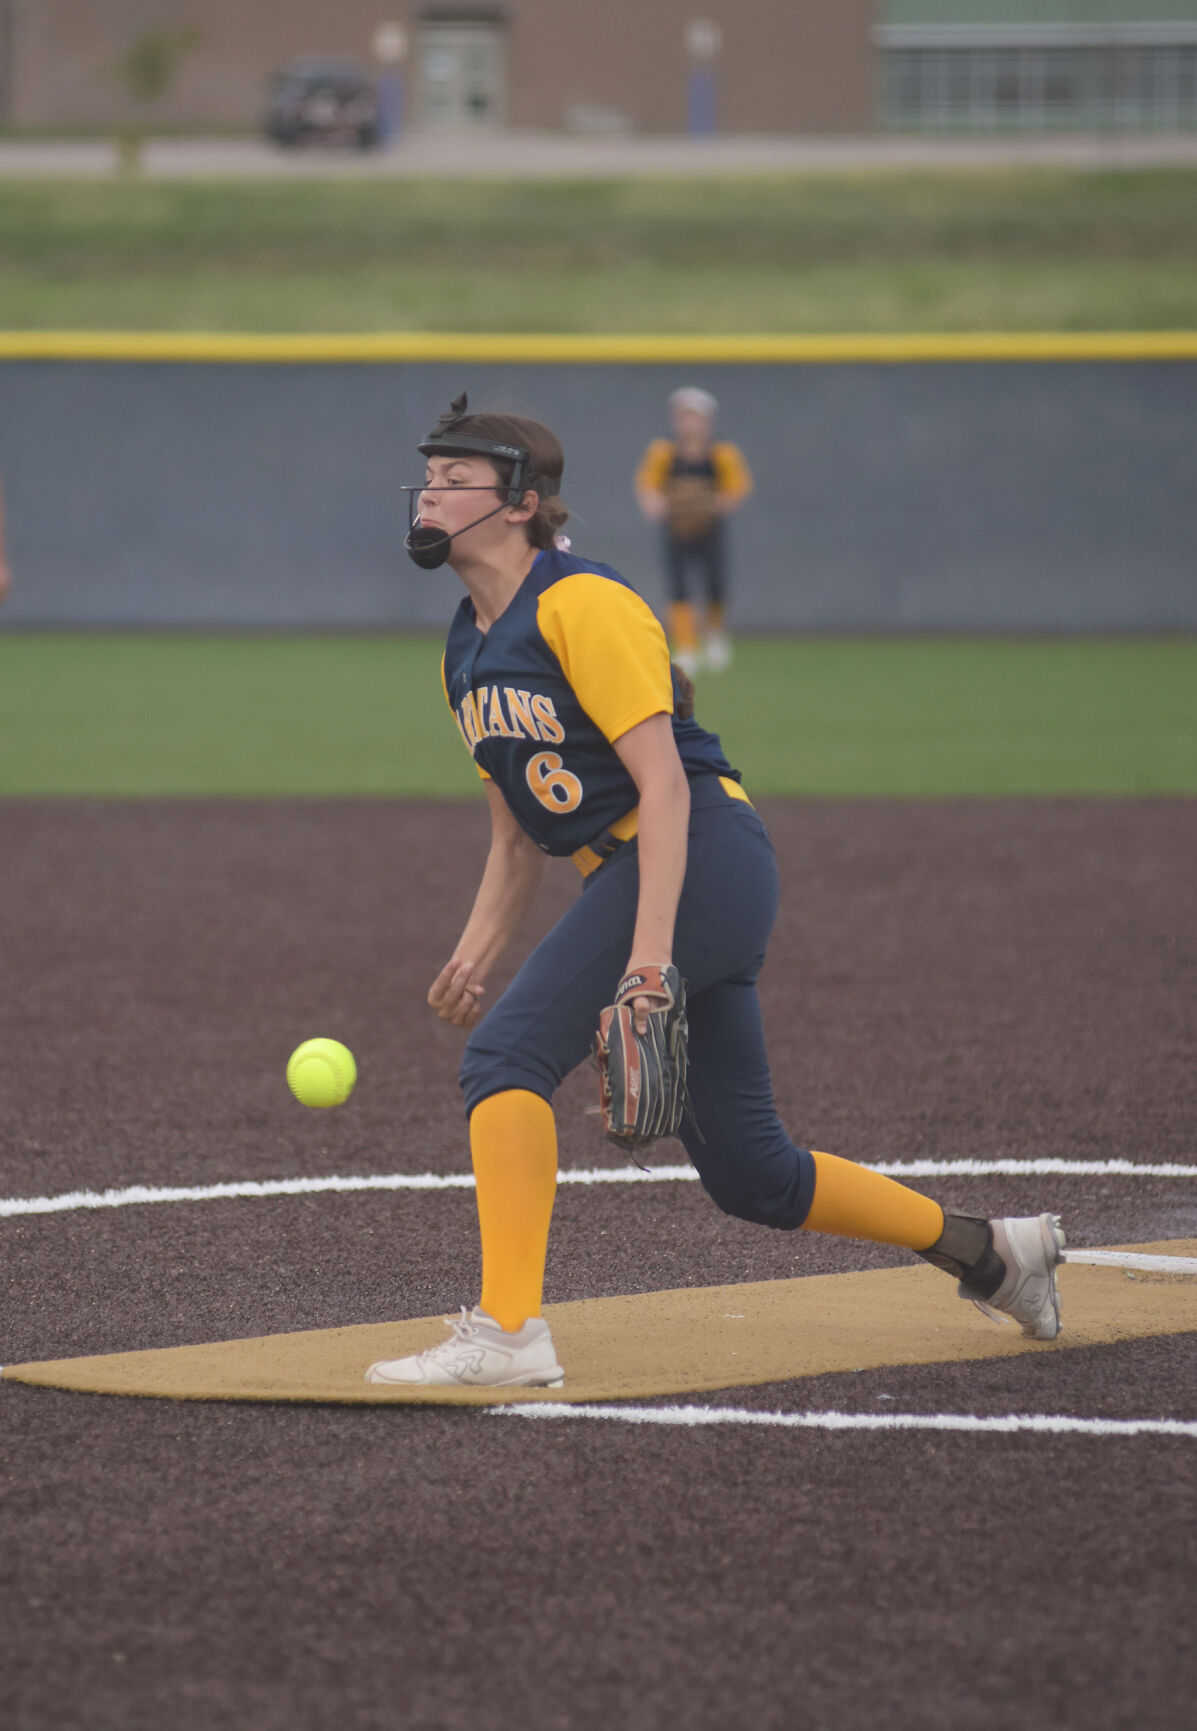 Battle High School pitcher Brooke Nutter pitches